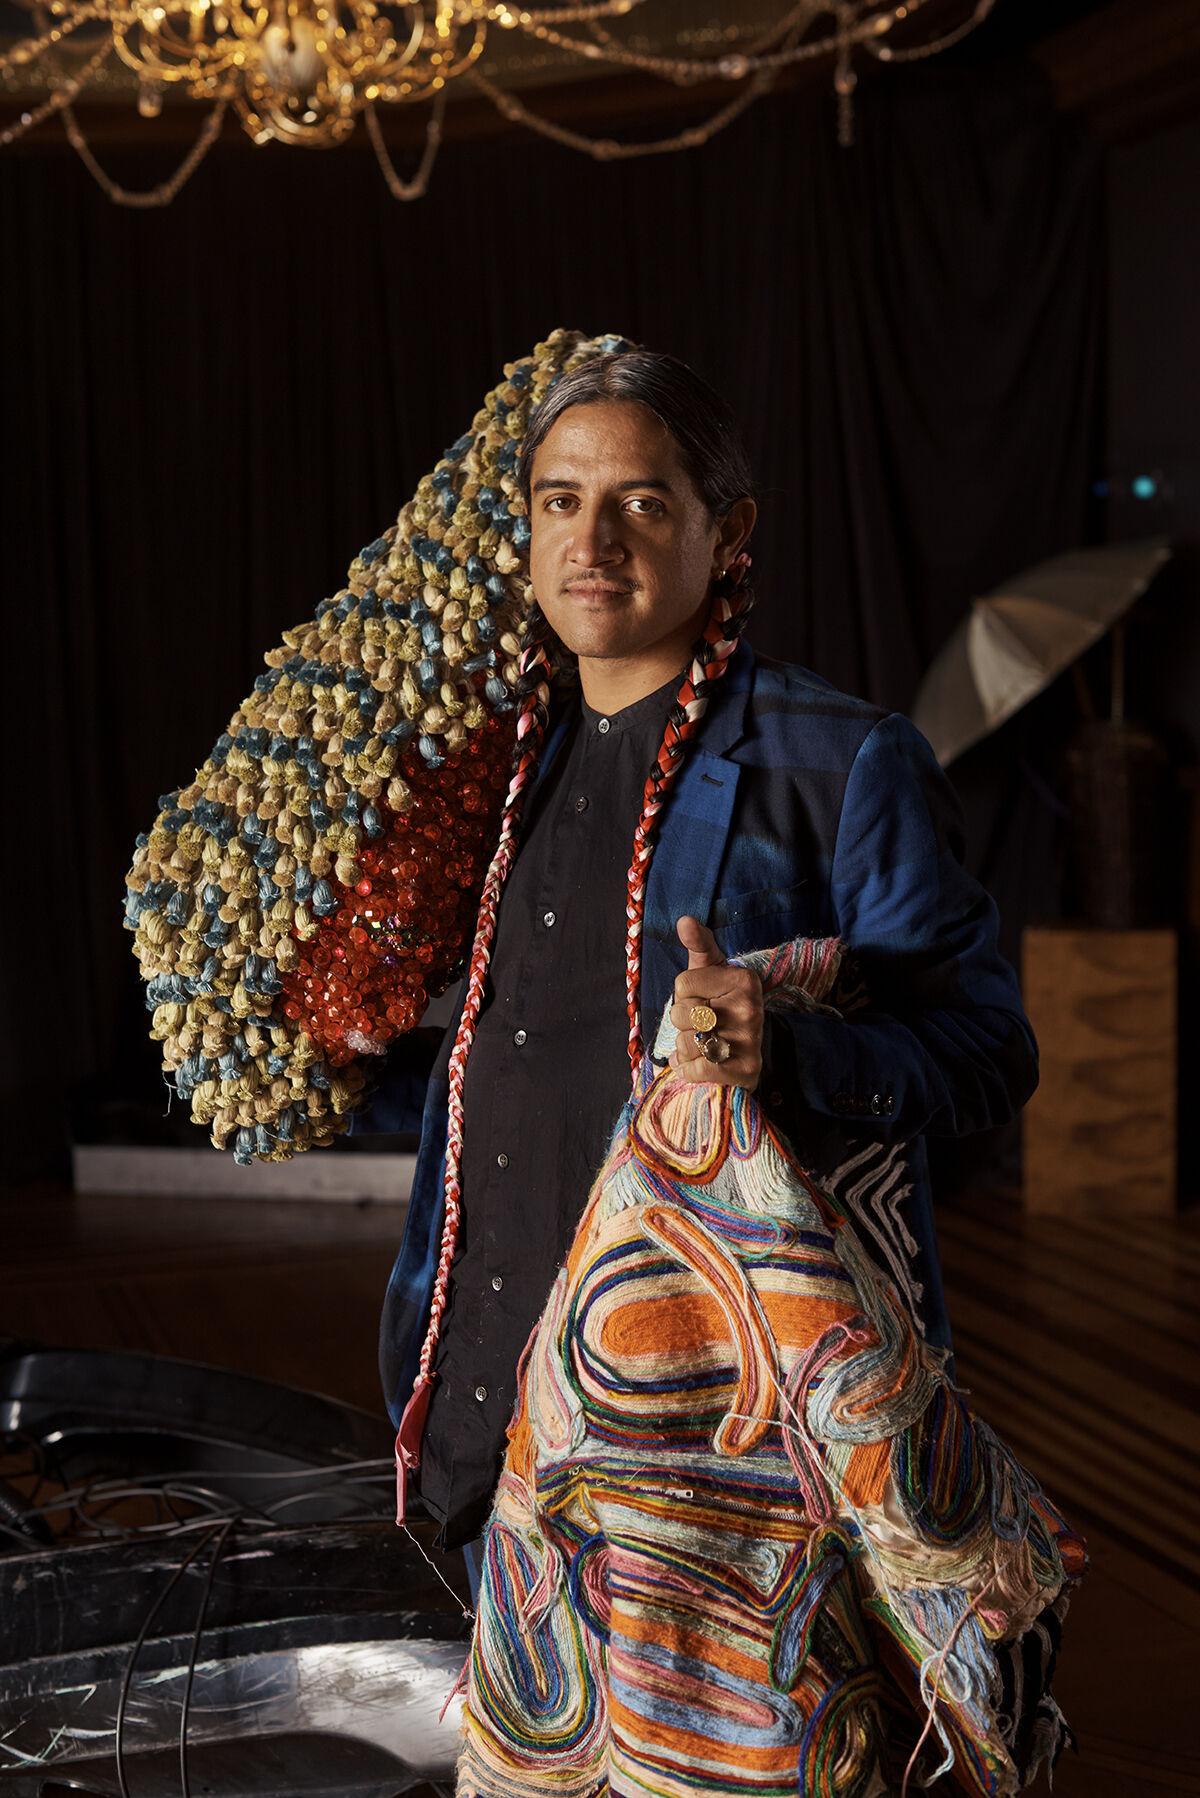 Portrait of Raúl de Nieves in his Queens studio by Alex John Beck for Artsy.